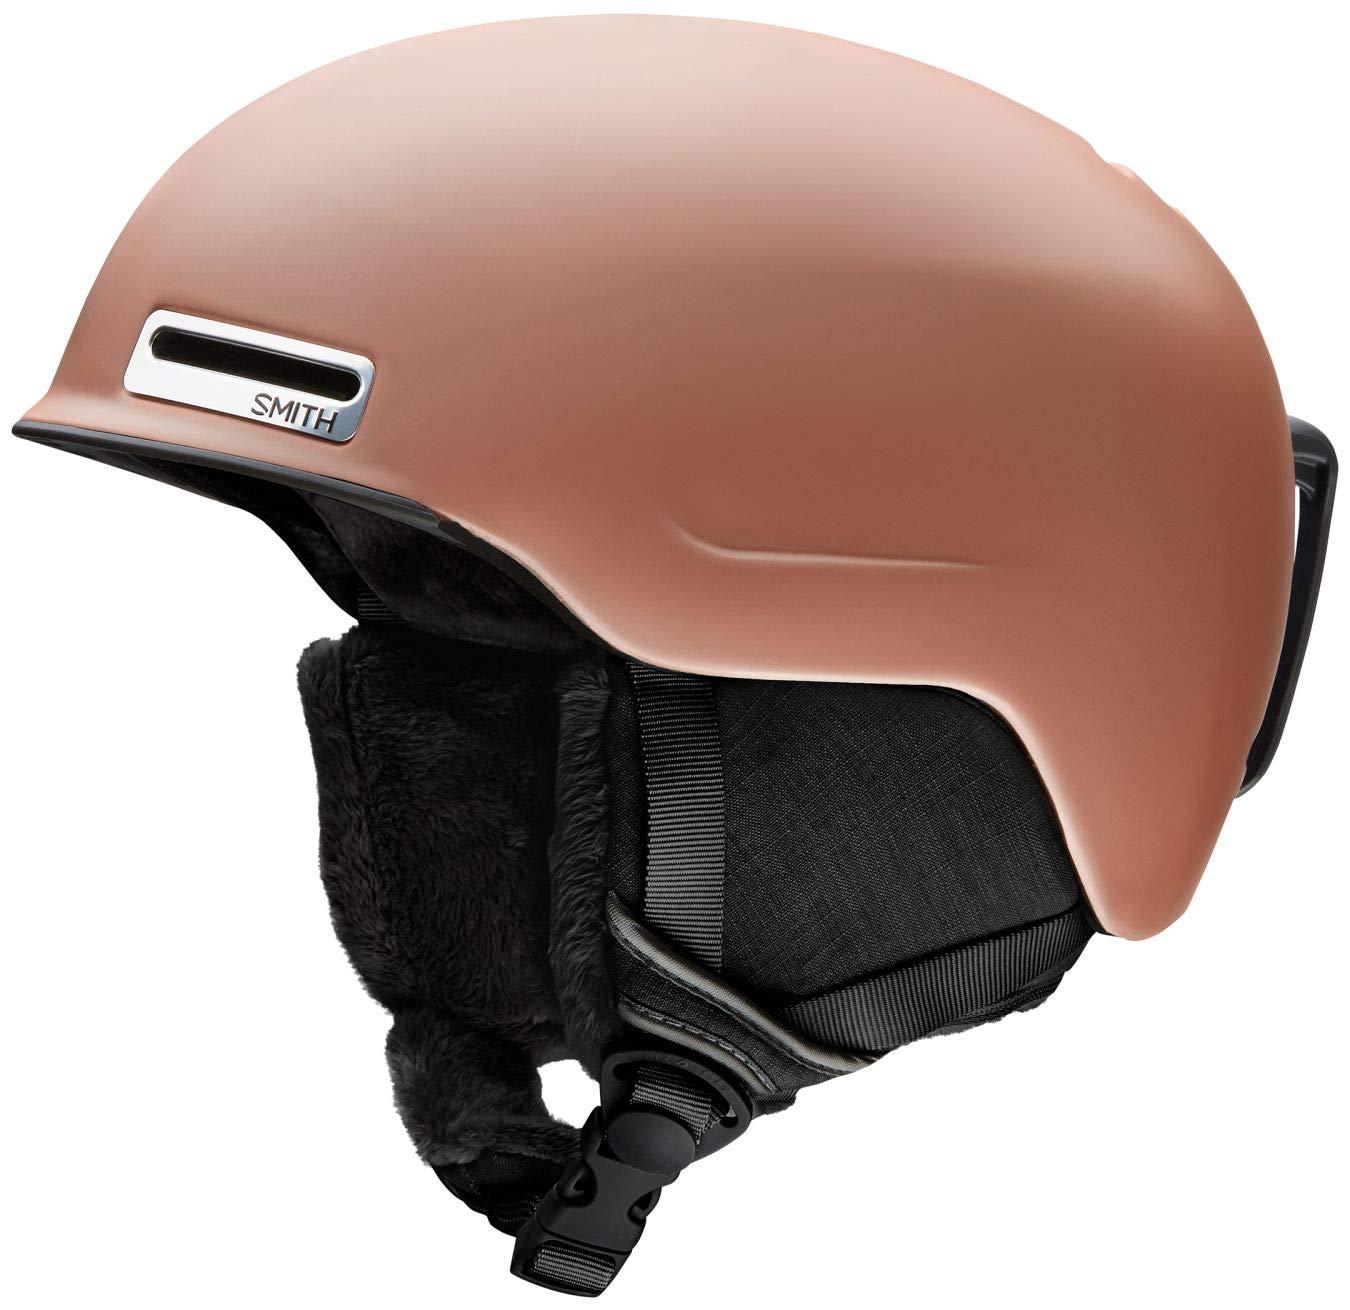 Smith Optics Allure Women's Ski Snowmobile Helmet - Matte Champagne/Large